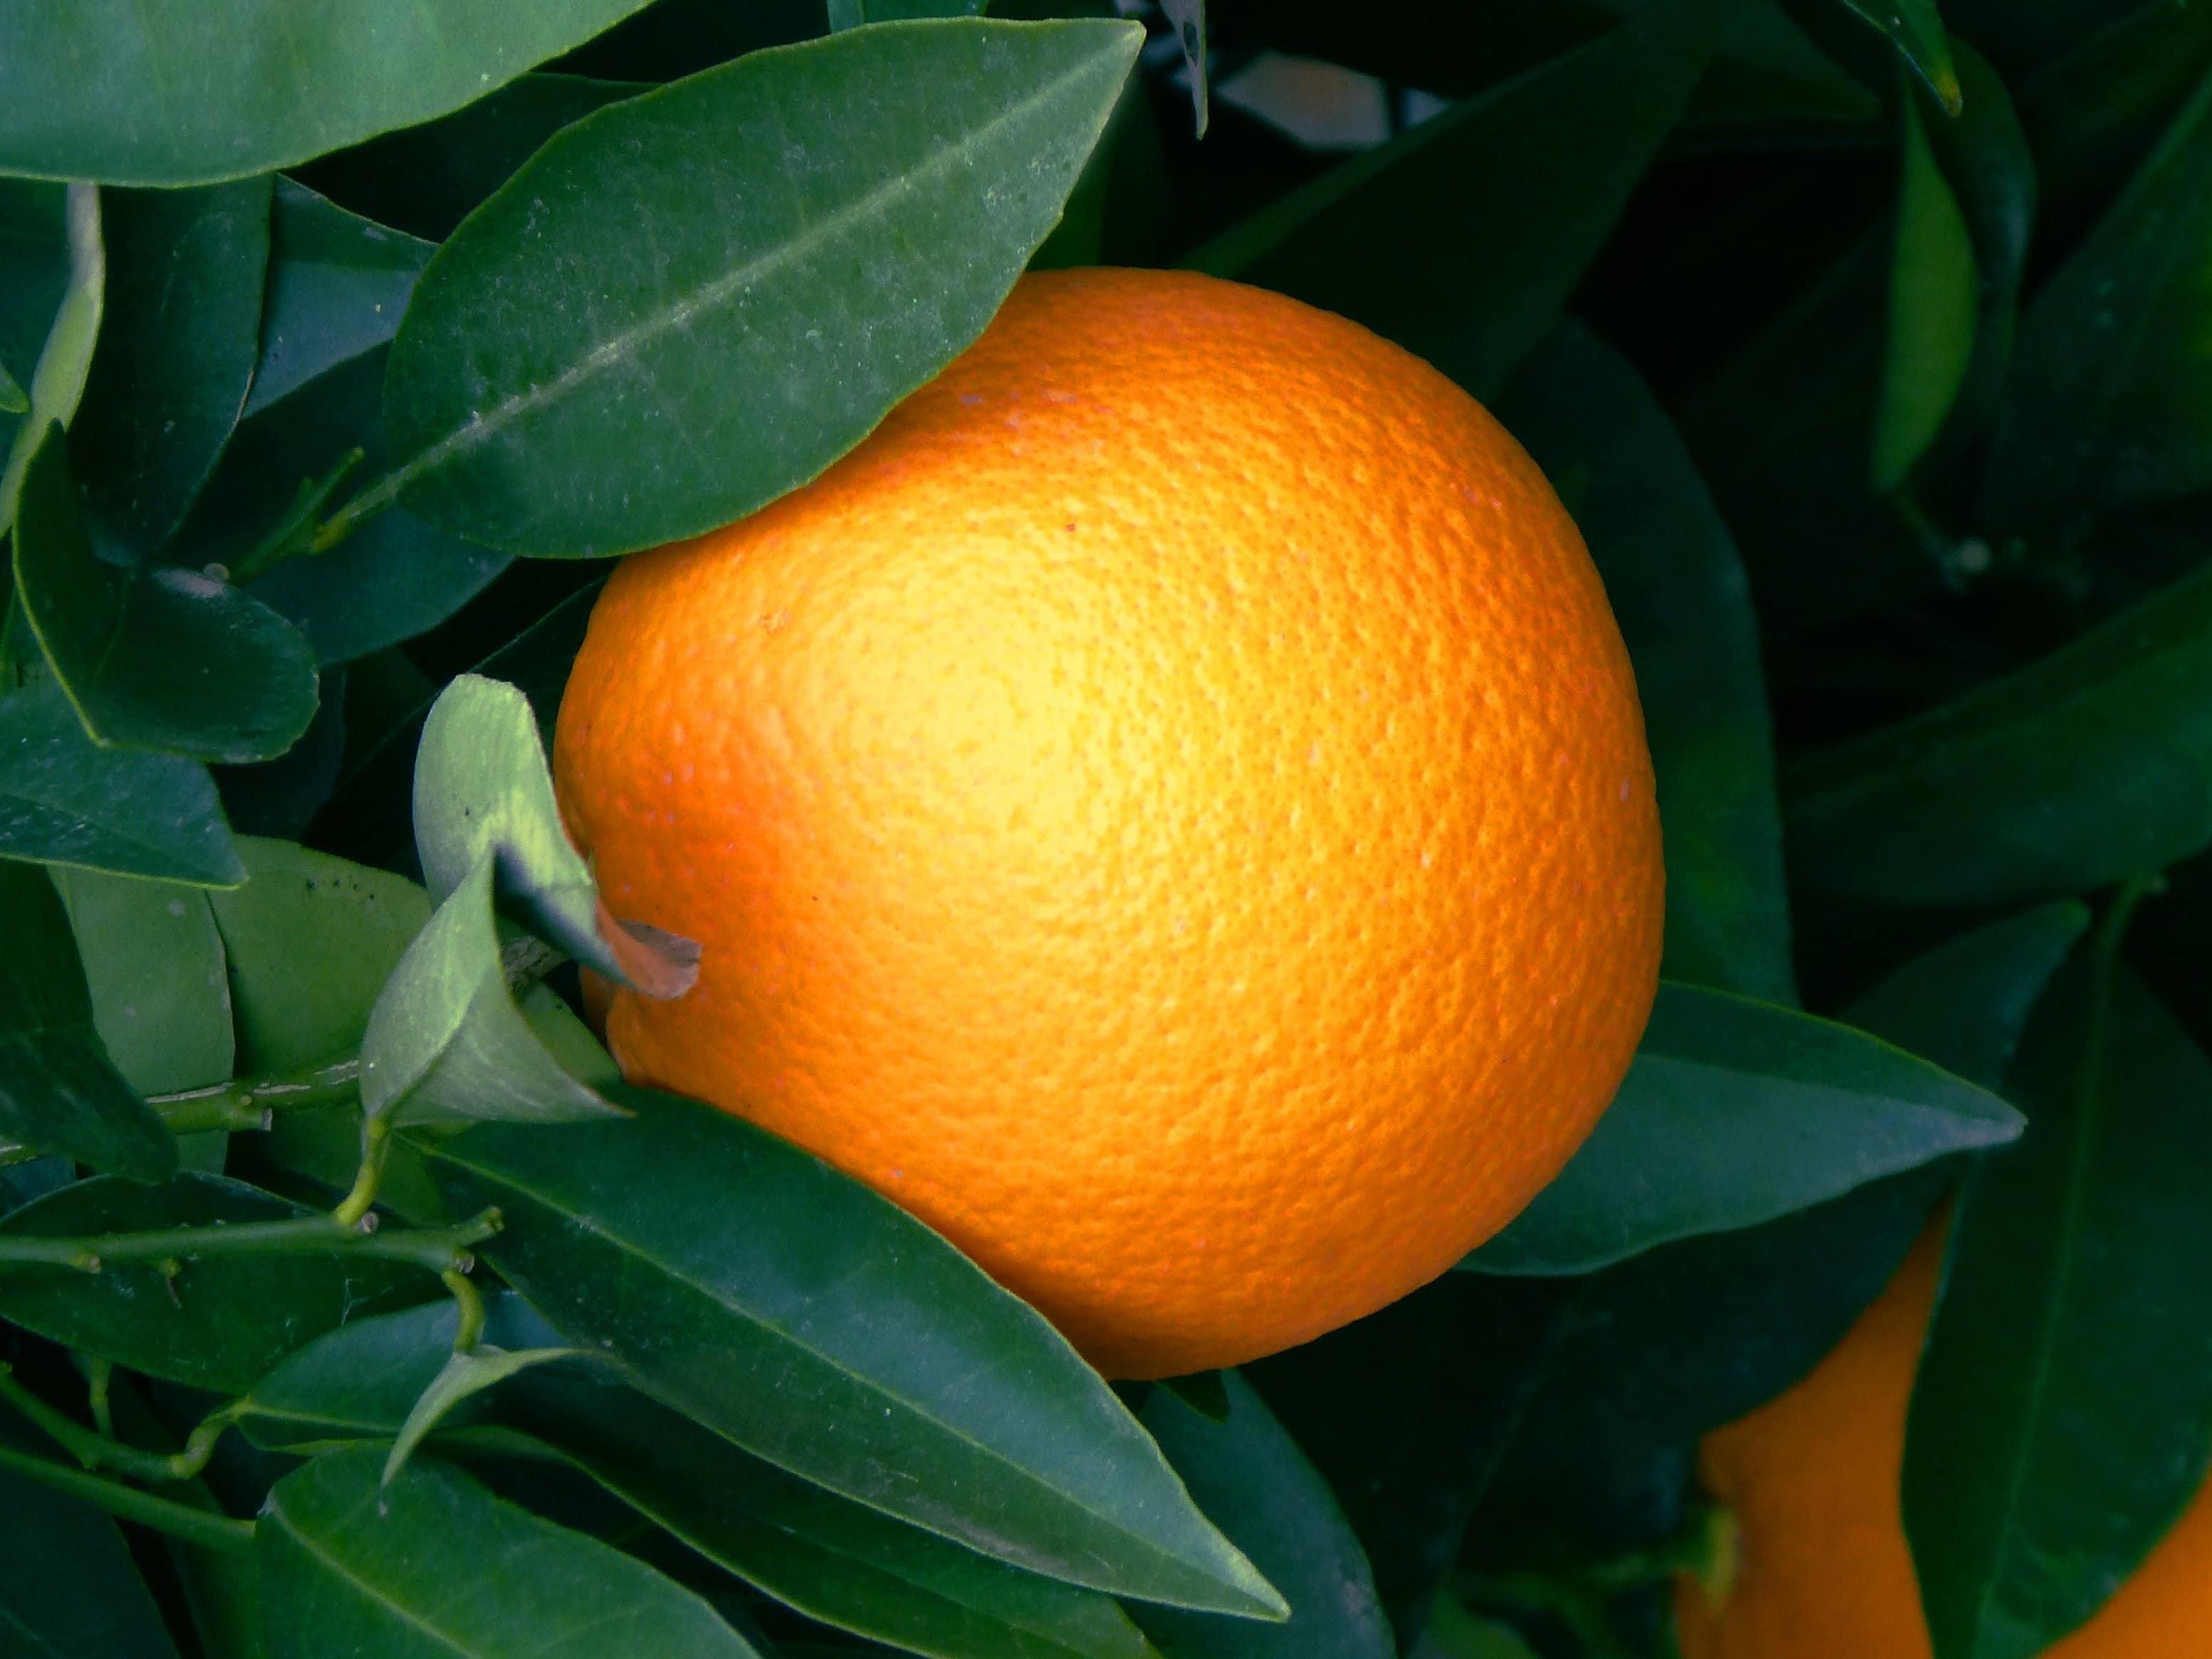 Free picture: orange fruit, leaf, food, citrus, mandarin, tangerine, vitamin, shadow, organic